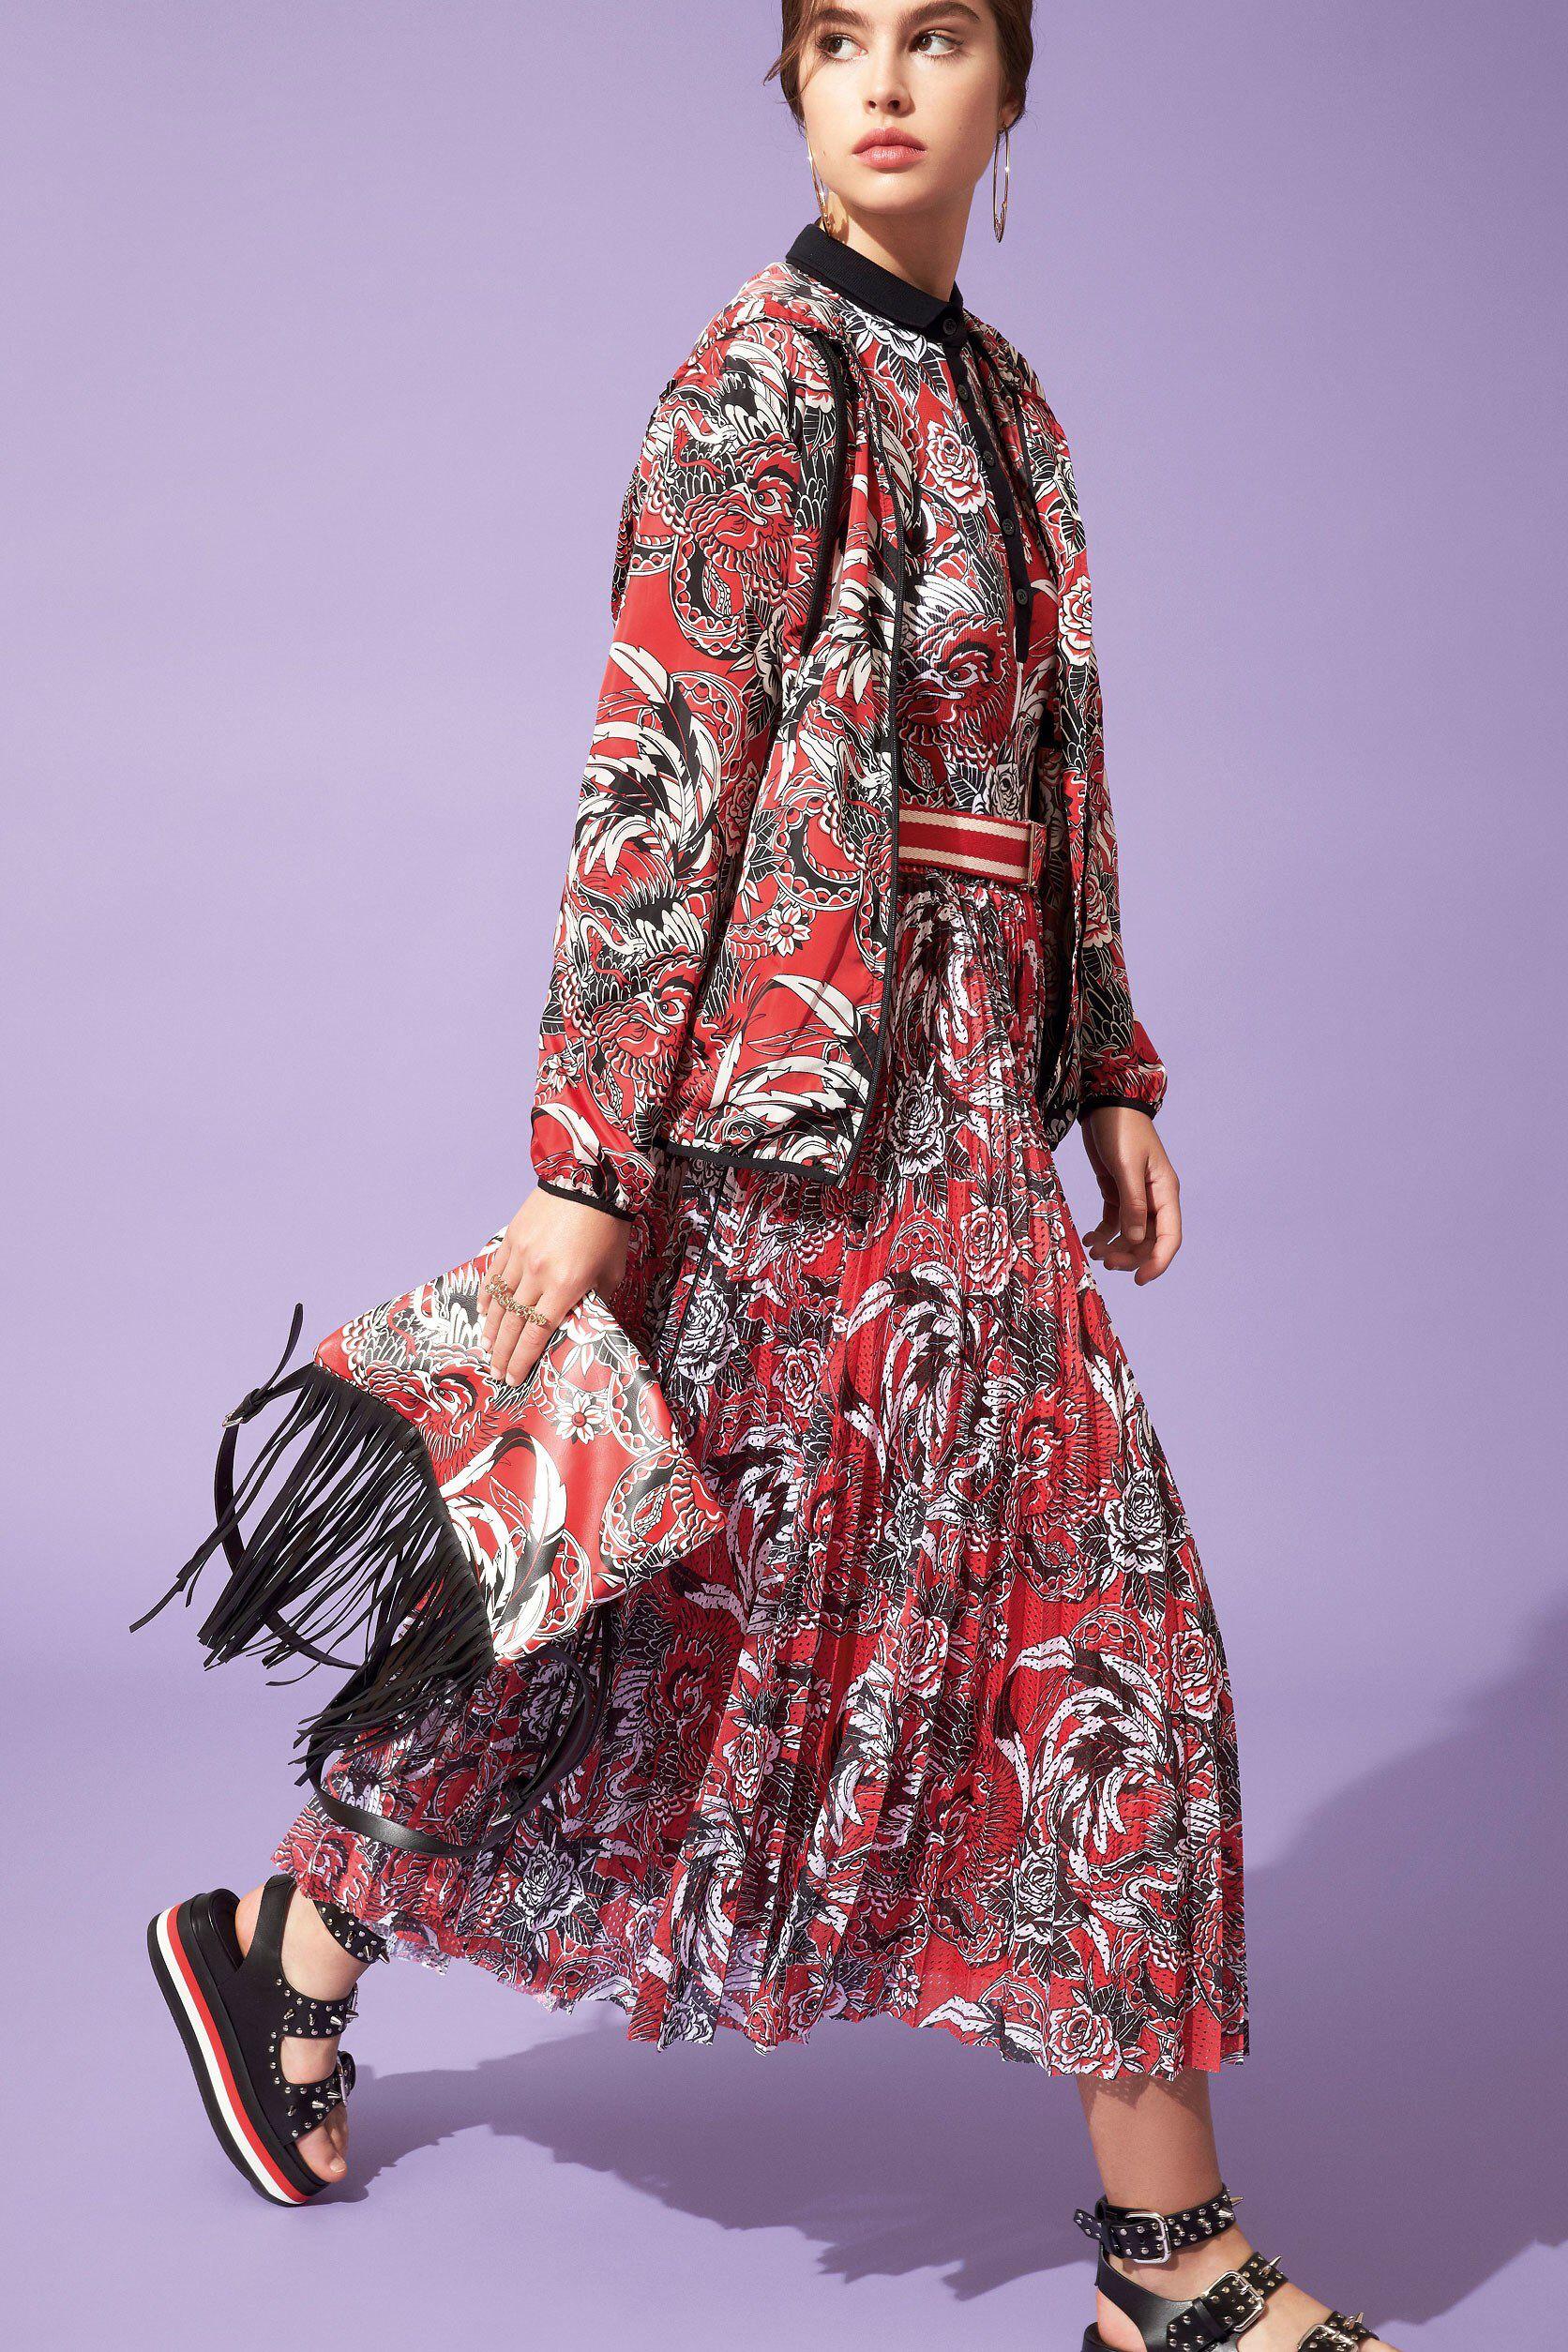 RED Valentino SpringSummer 2019 Collection – New York Fashion Week RED Valentino SpringSummer 2019 Collection – New York Fashion Week new picture